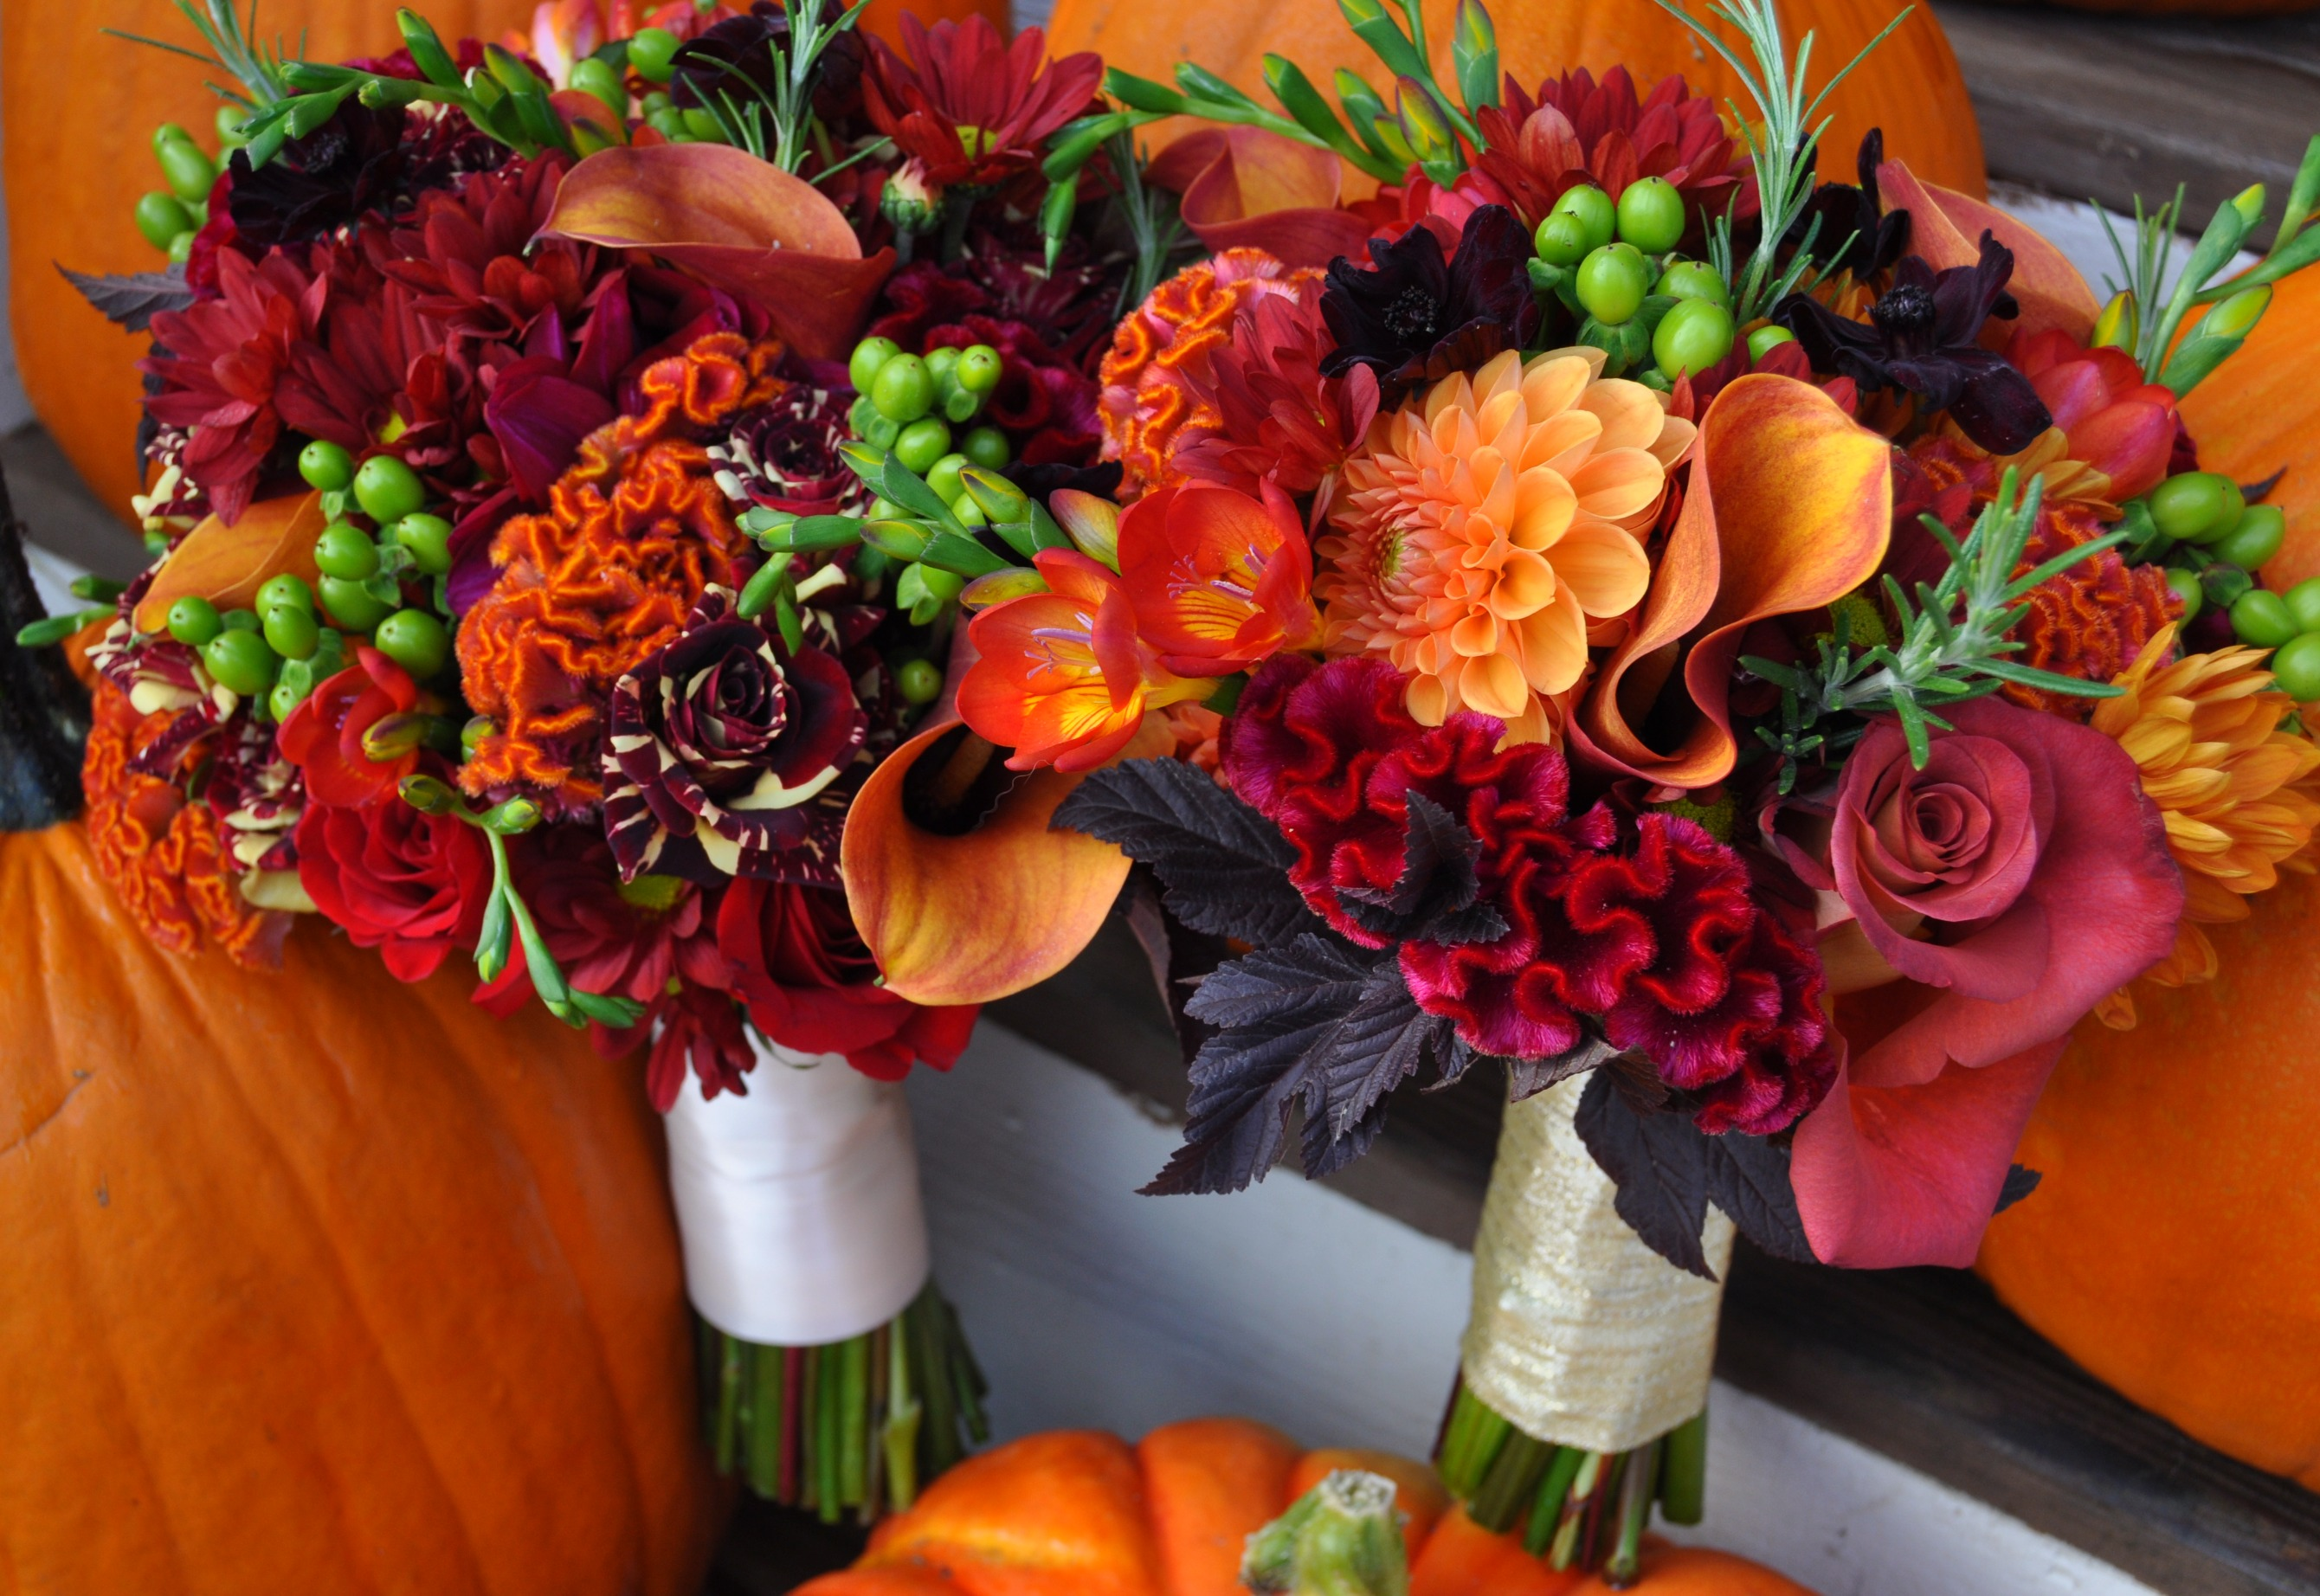 fall-wedding-color-schemes-with-dear-autumn-please-inspire-me-for-my-wedding-decor.jpg